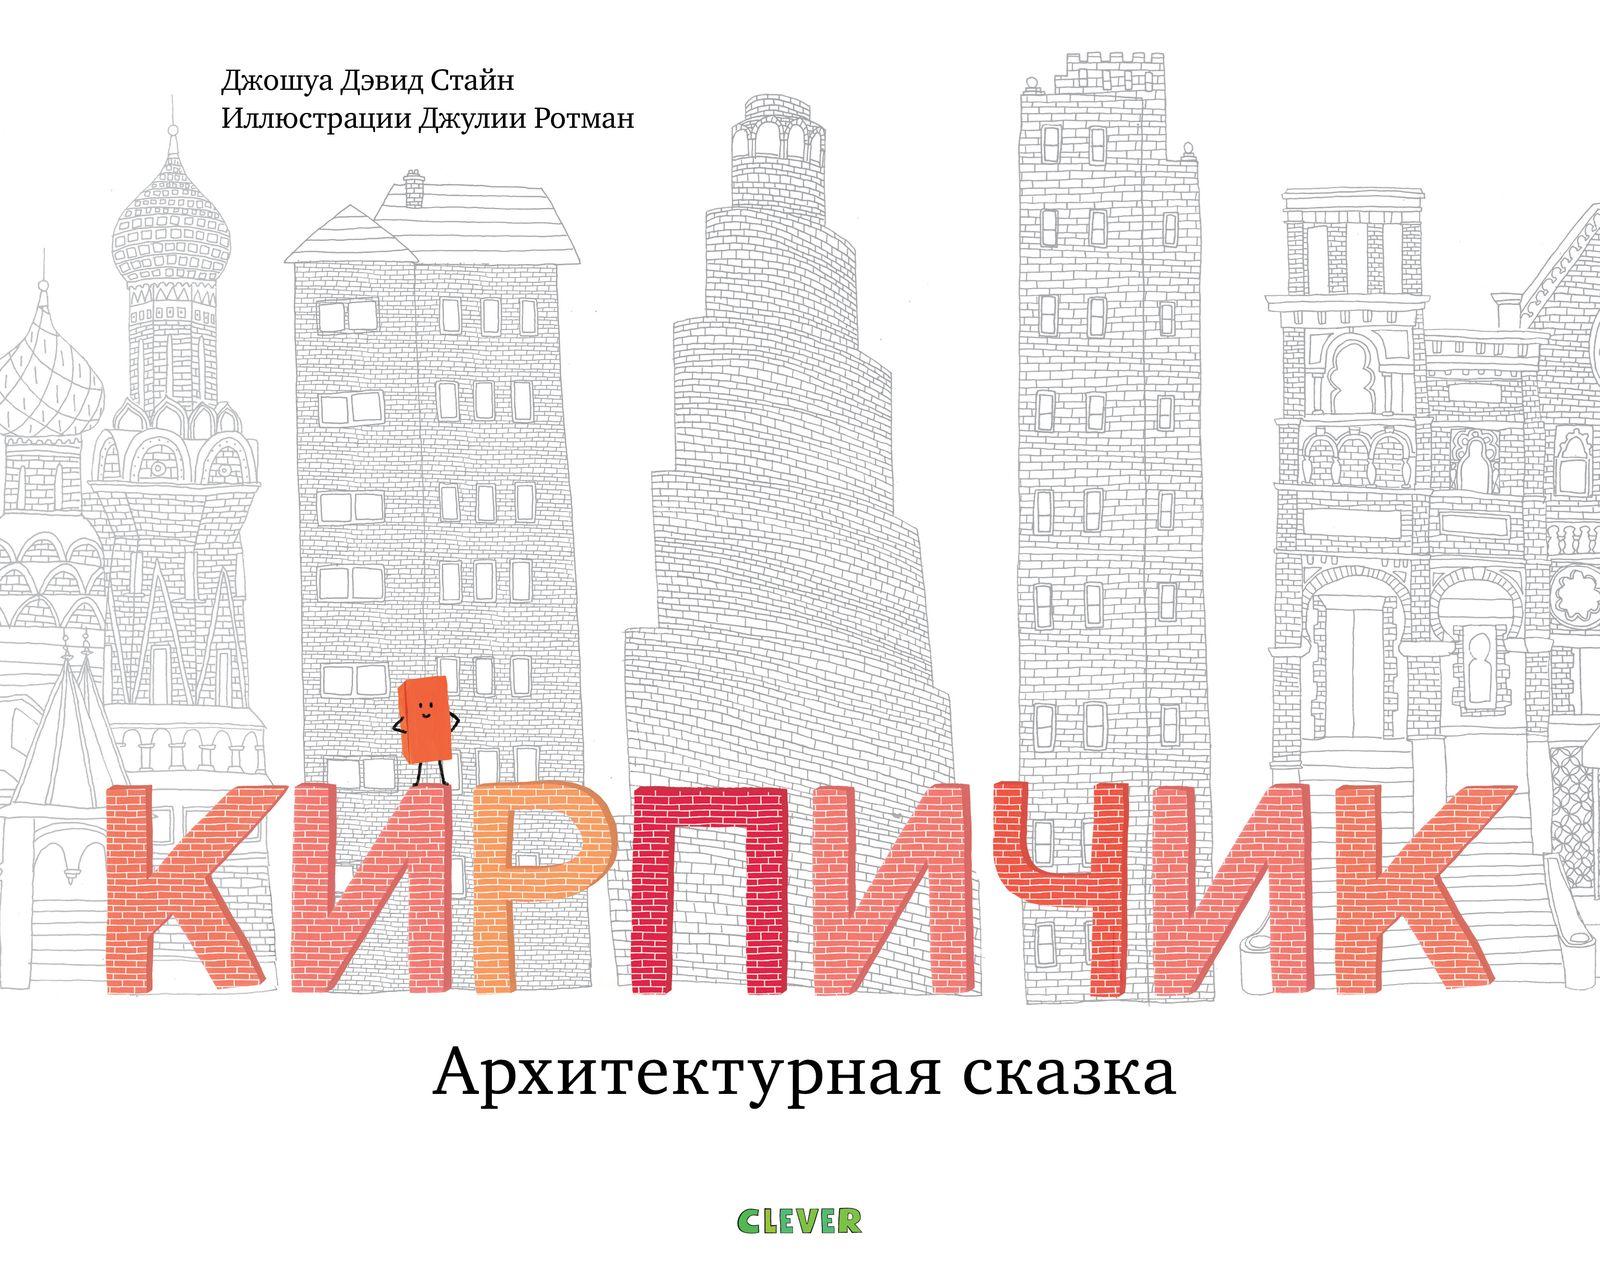 Кирпичик. Архитектурная сказка фото